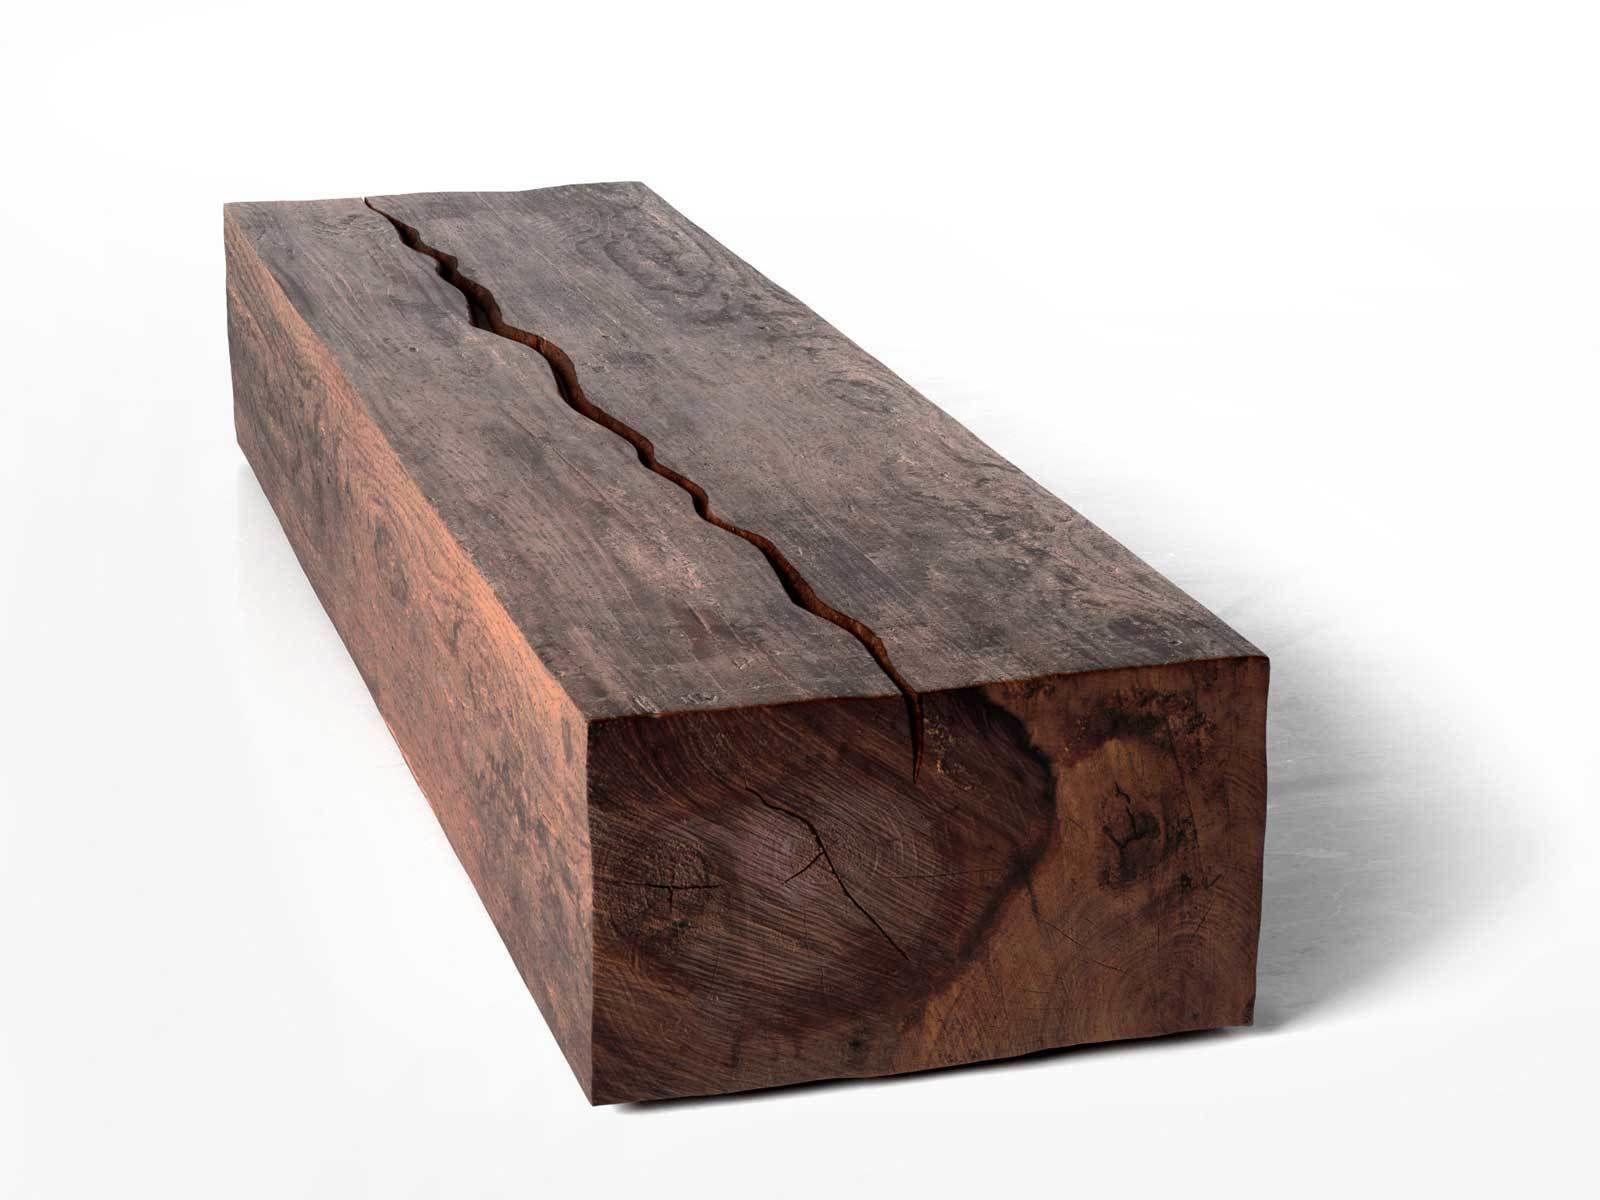 Half Log Coffee Table Log Furniture Log Cabin Furniture Homemade Furniture [ 2304 x 3072 Pixel ]